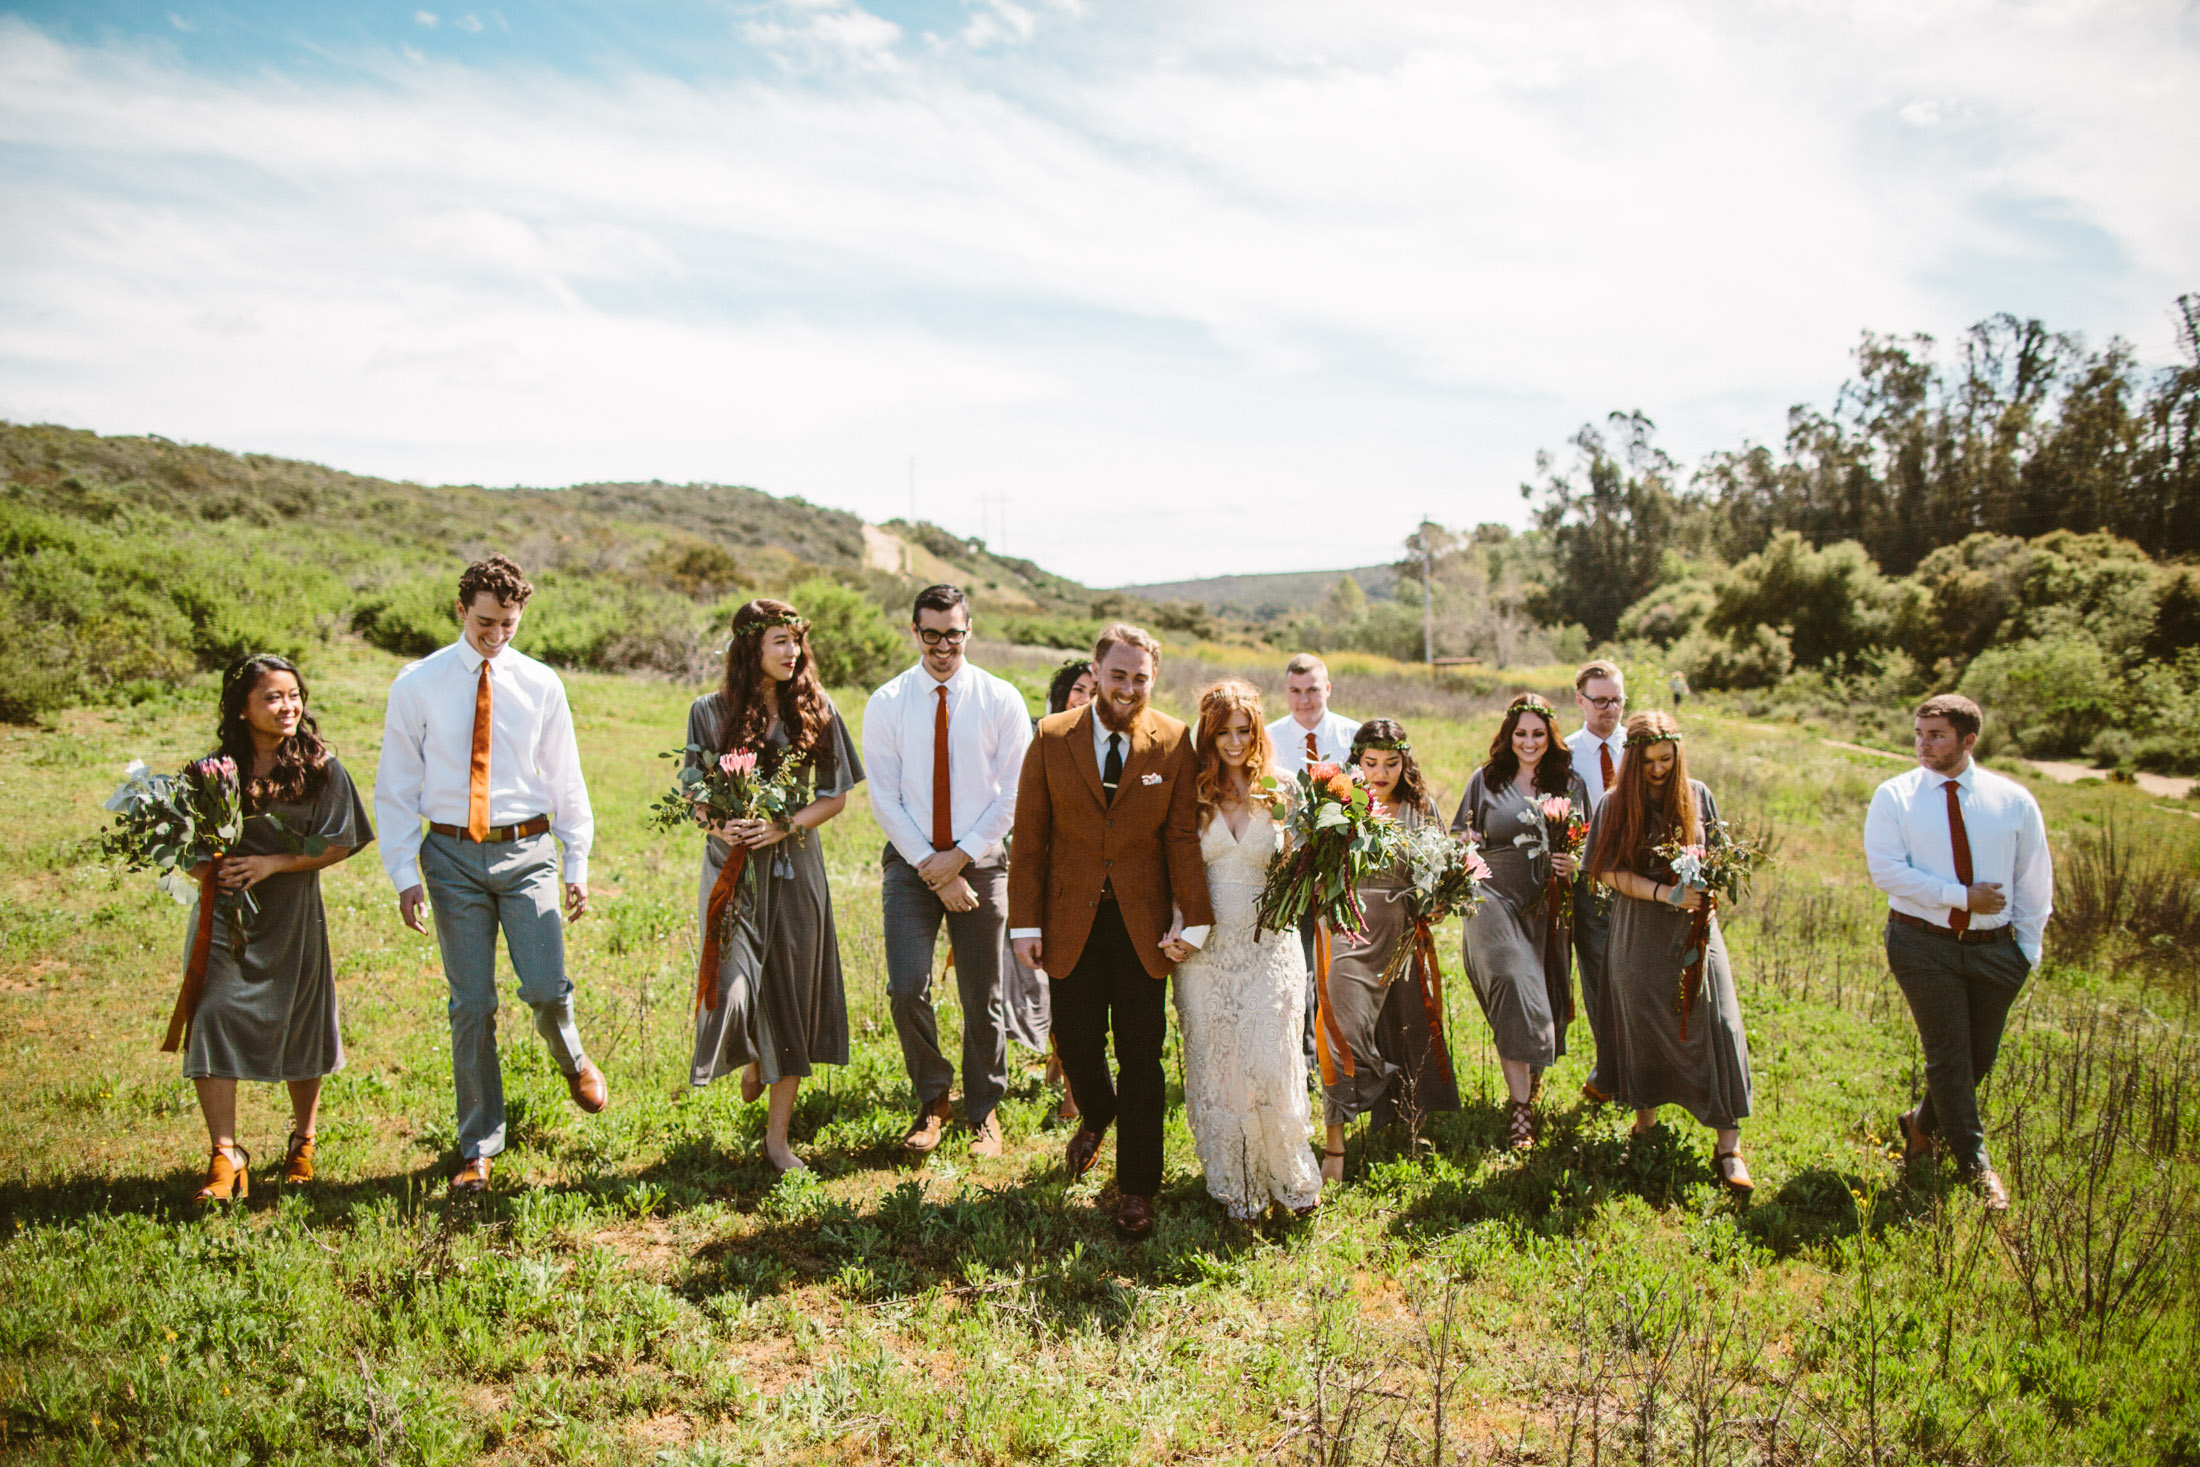 The-woodshed-booze-brothers-venue-wedding-19.jpg